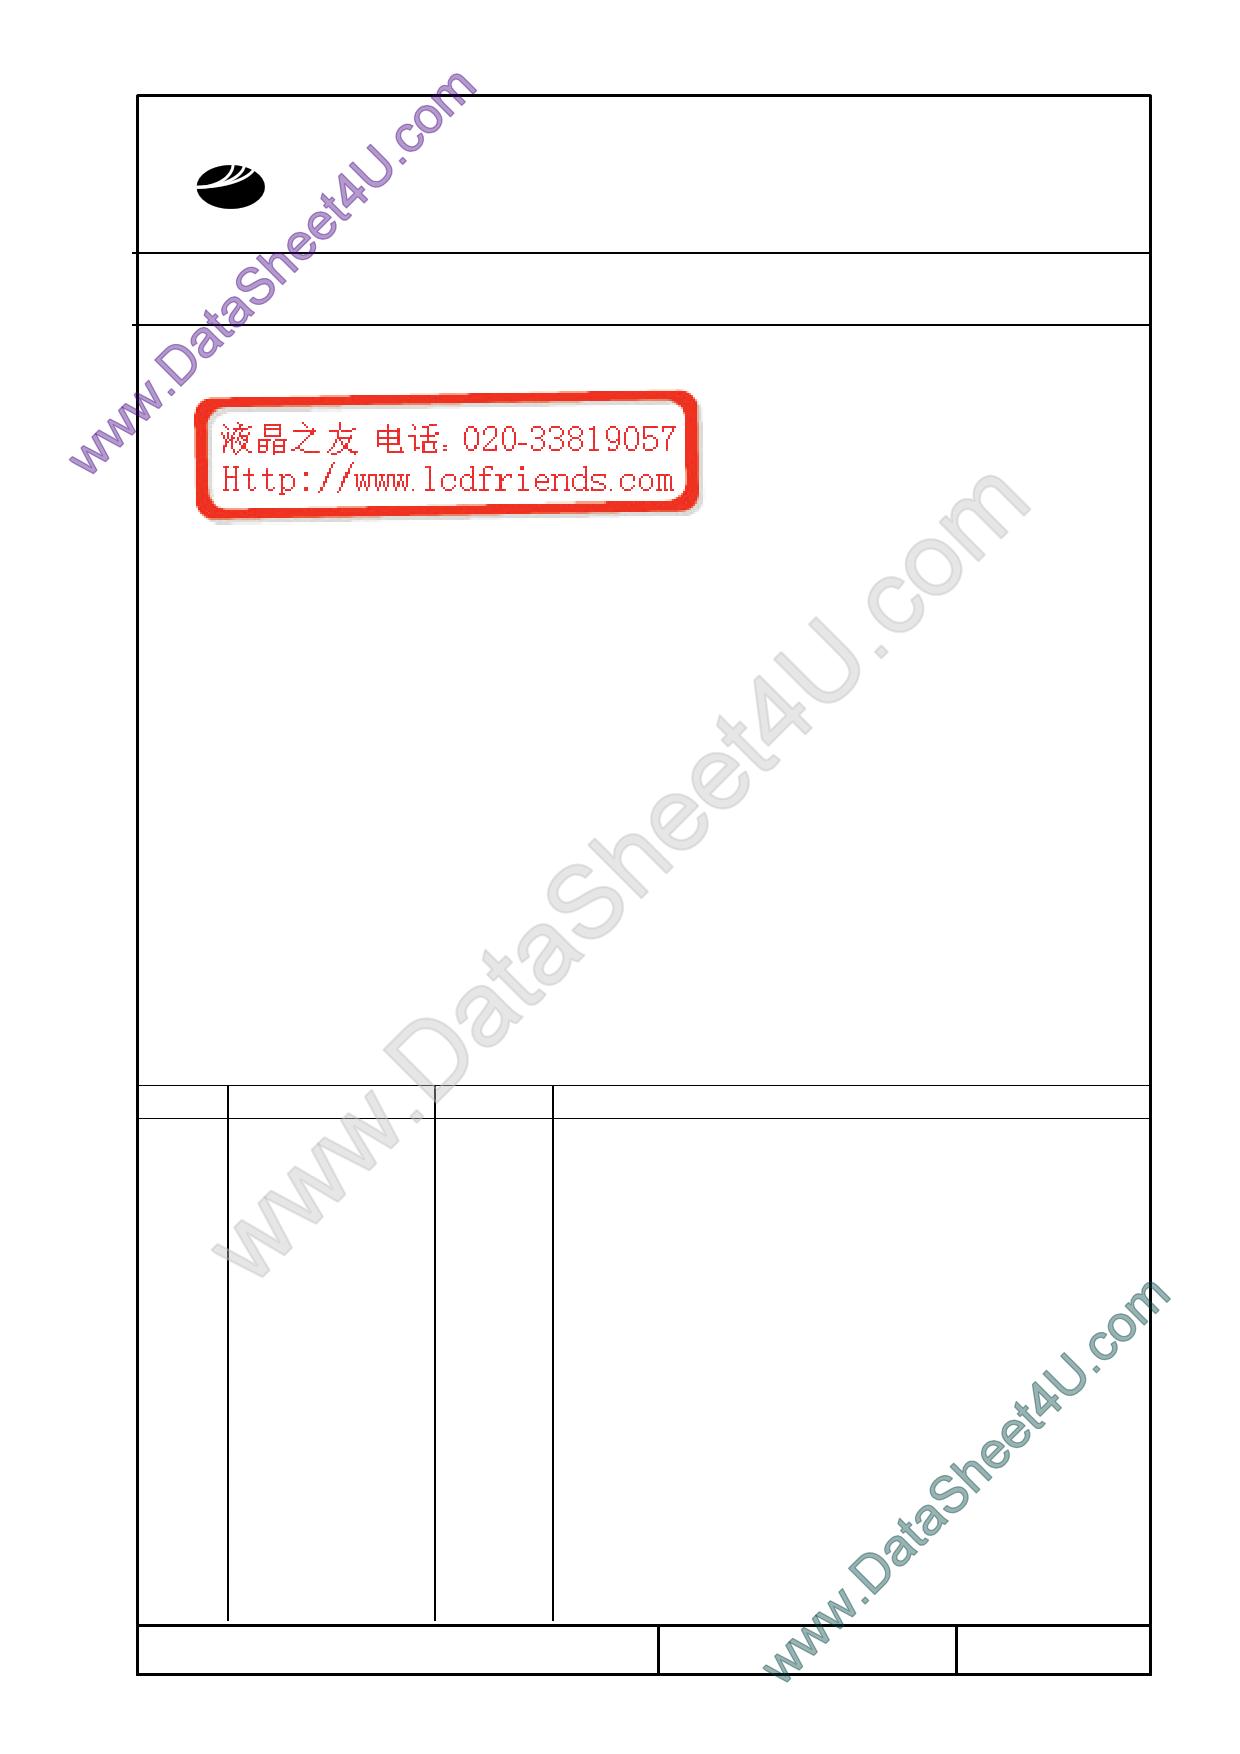 T-51378L025J_FW_P_AB datasheet